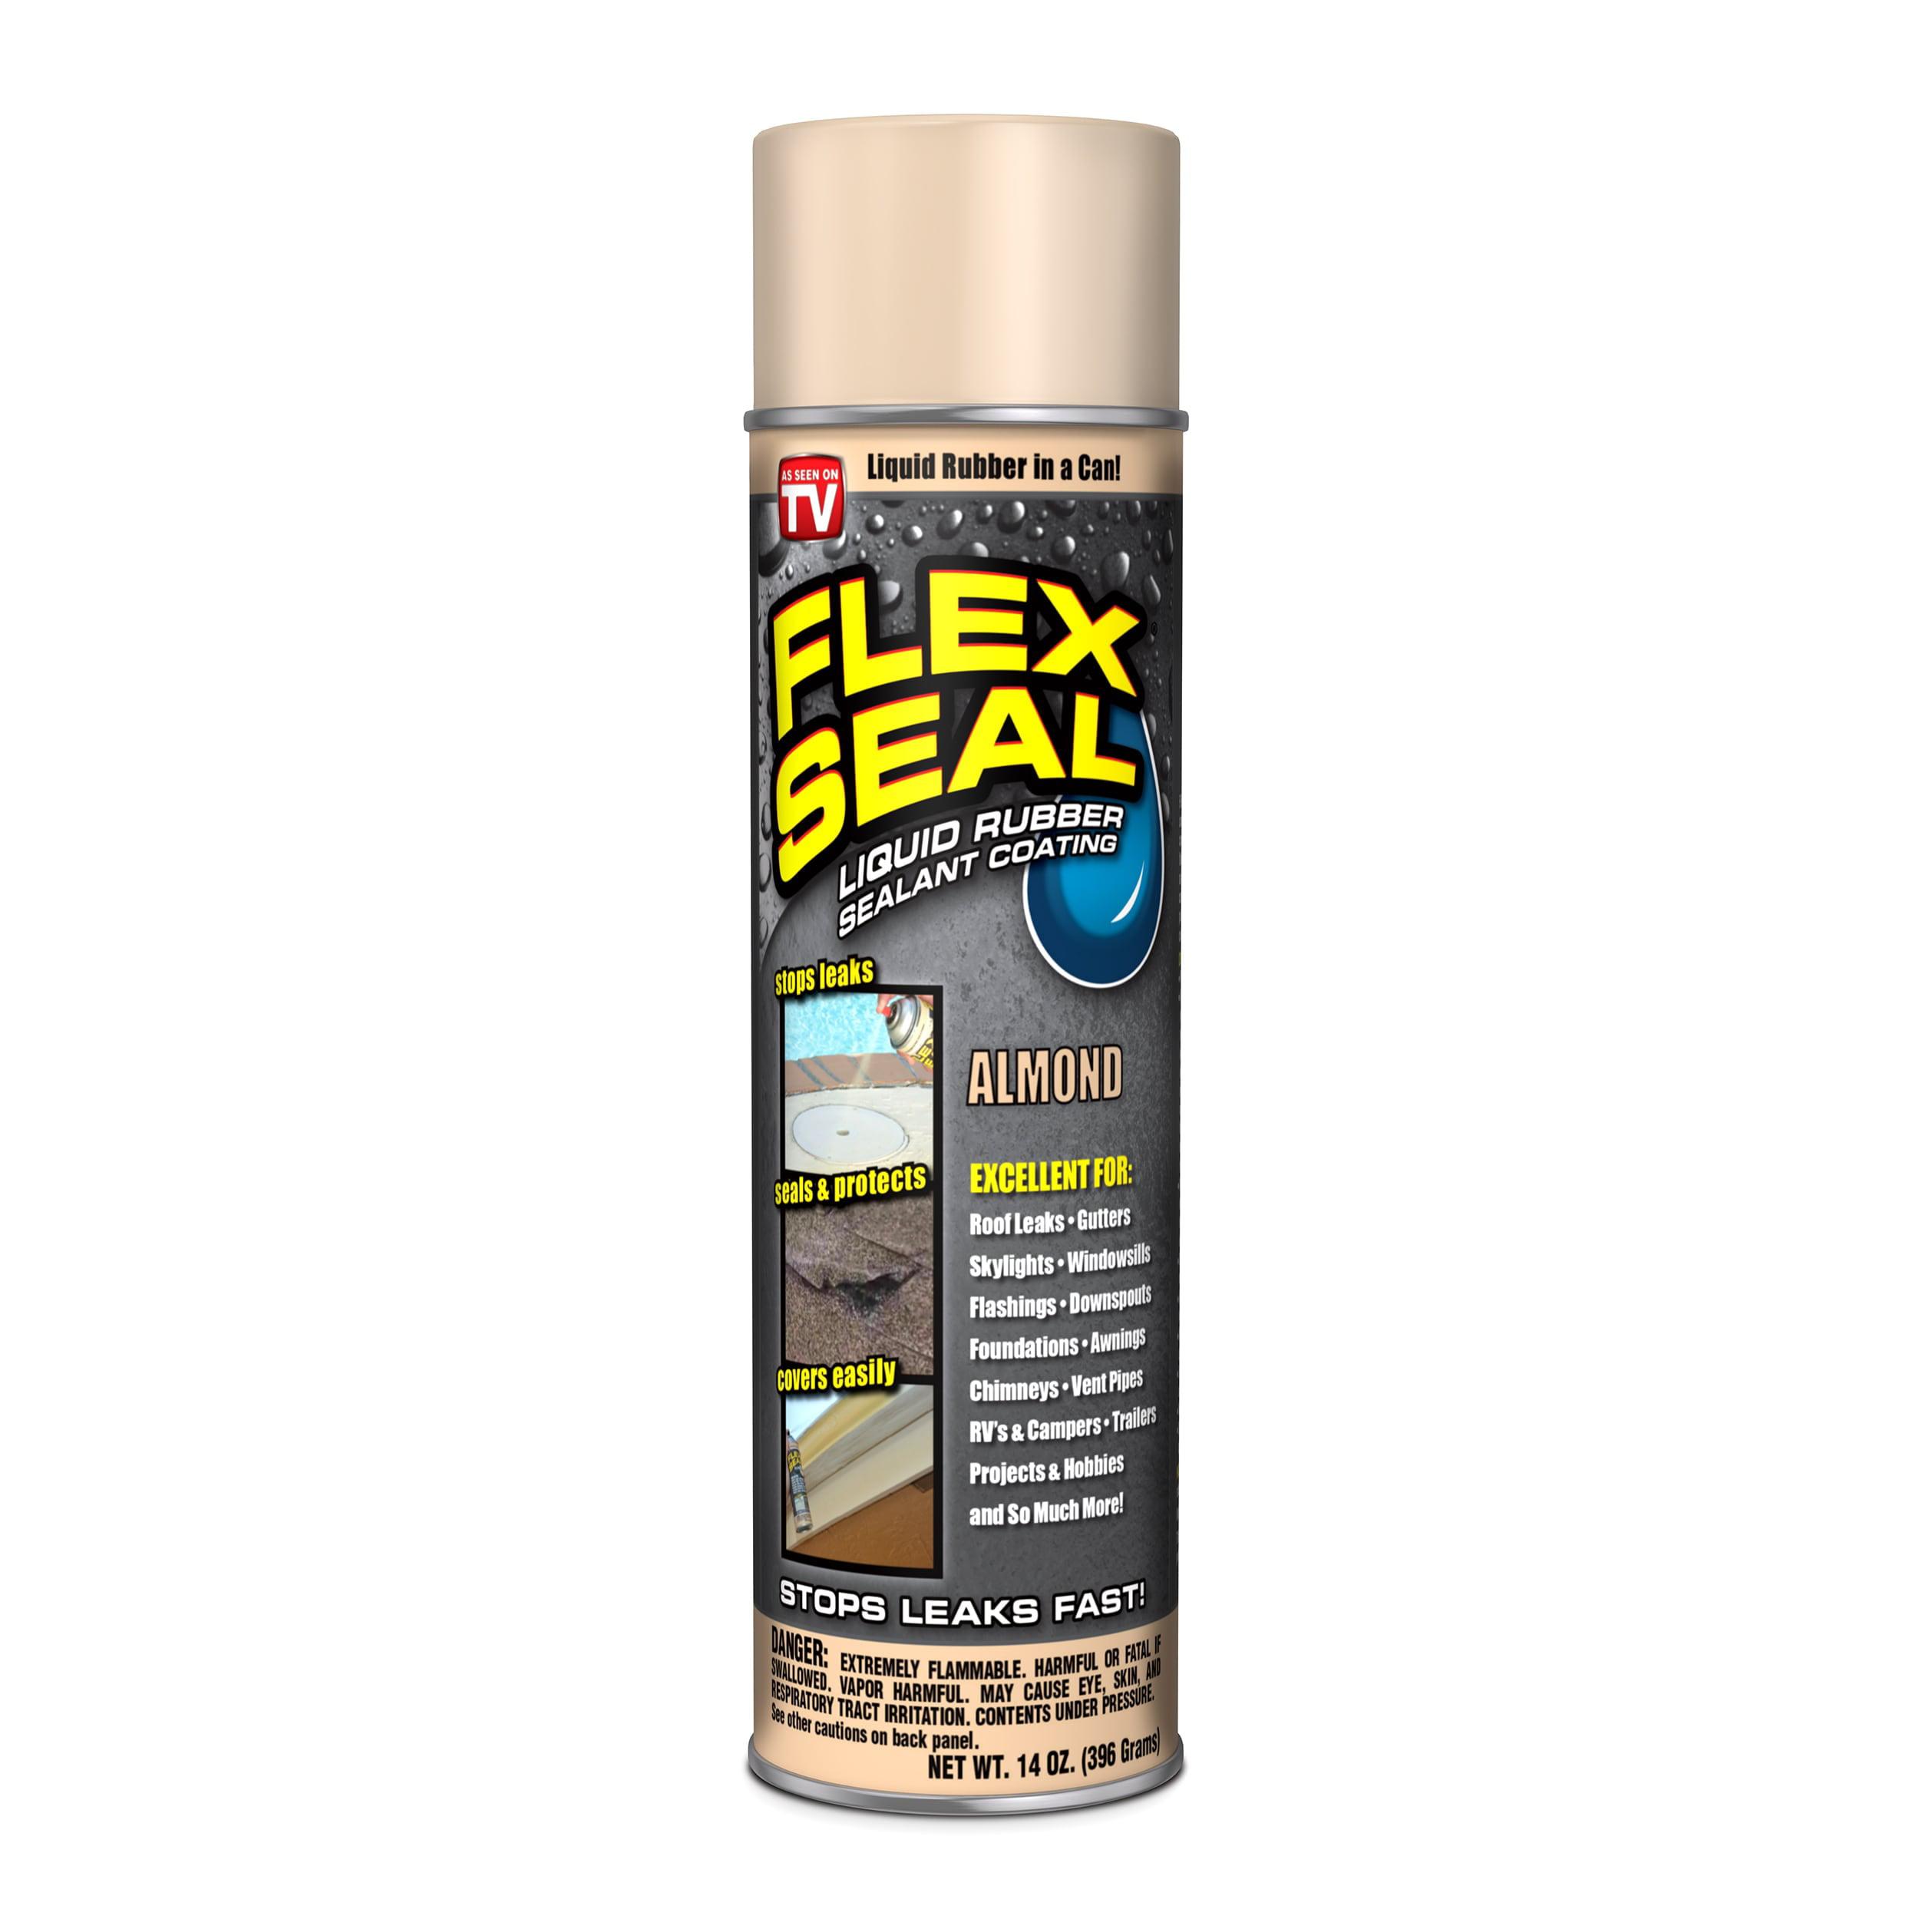 Flex Seal Spray Rubber Sealant Coating, 14-oz, Almond